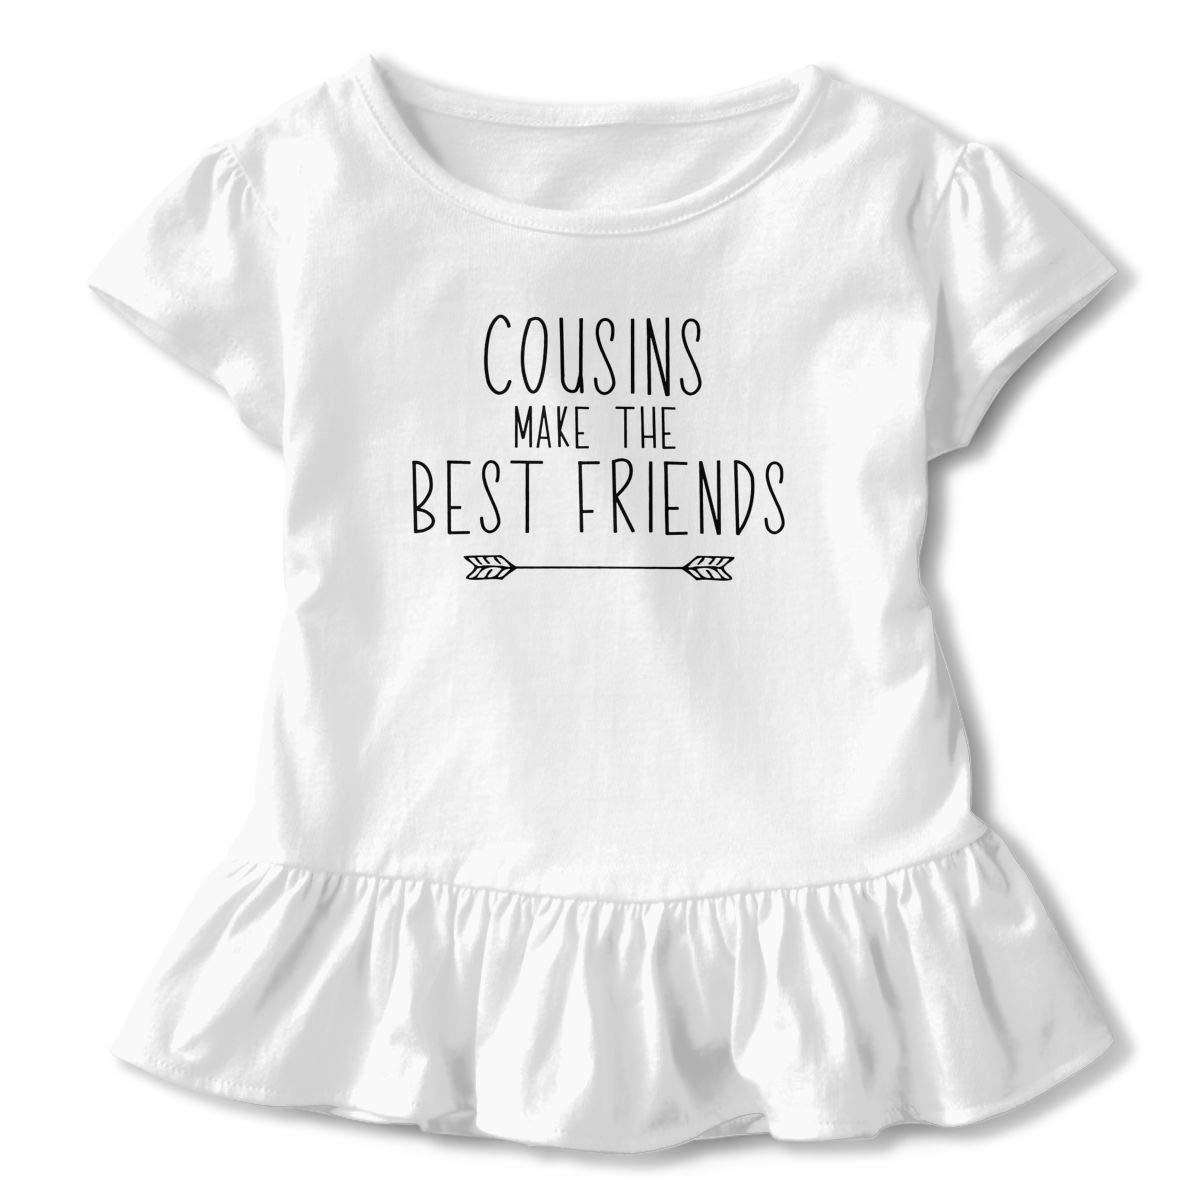 Cousins Make The Best Friends Cotton Toddler Girls' Short Sleeve Ruffle Tshirts For 2-6T Girl Richard Barajasa